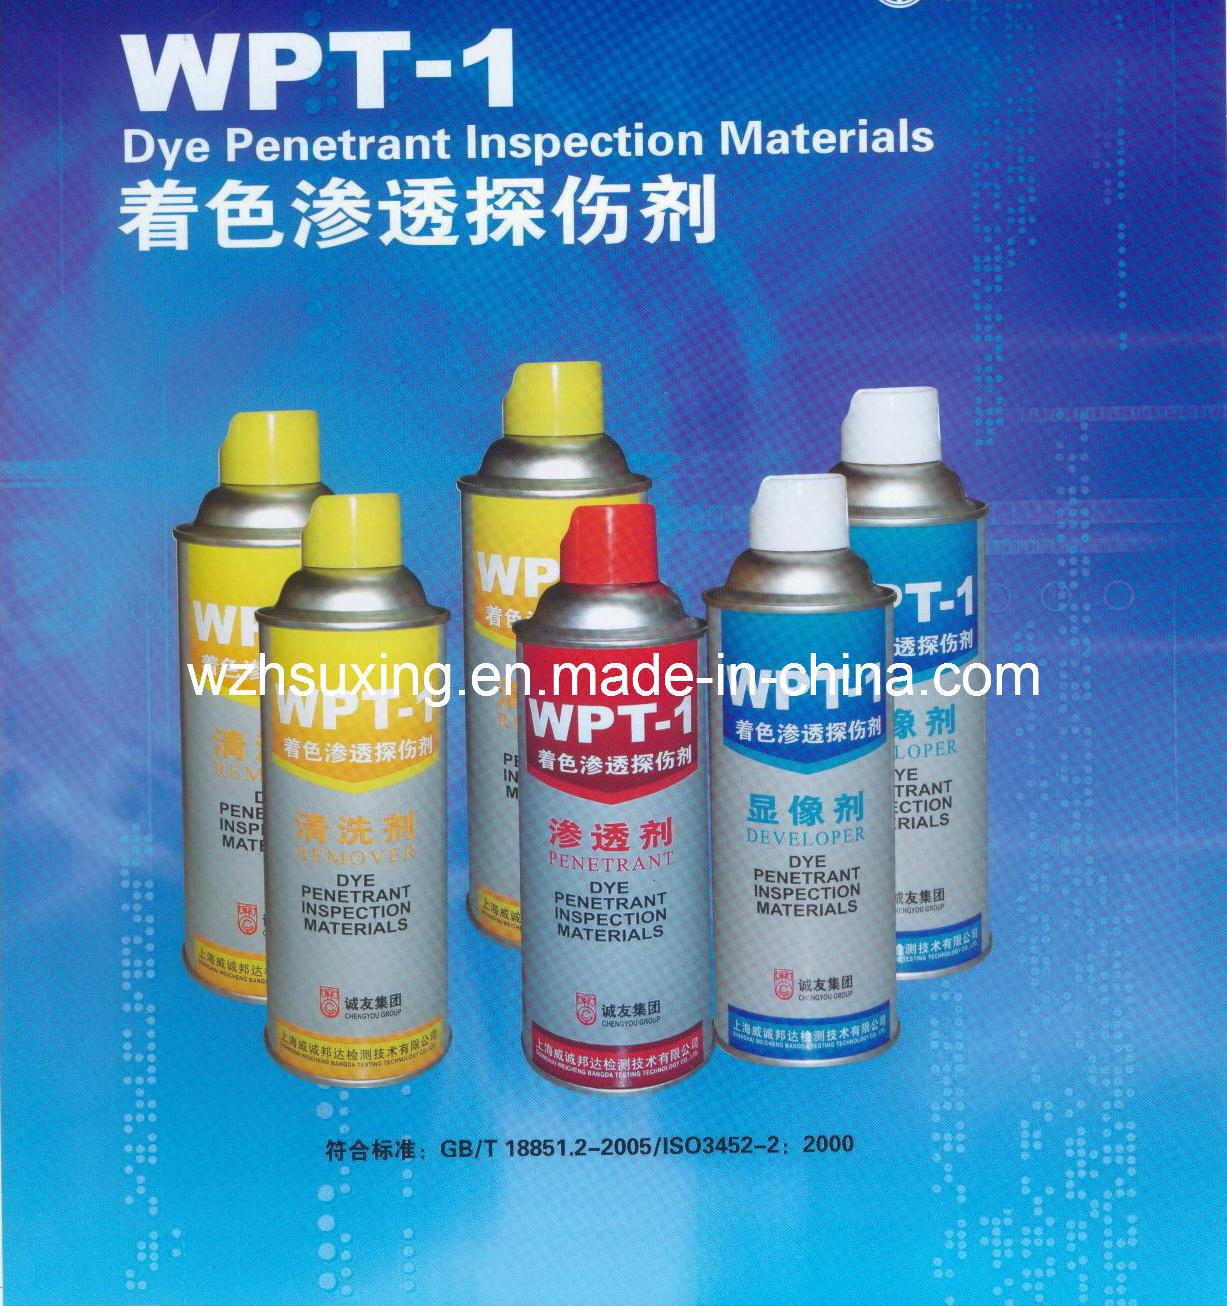 Dye Penetrant Insepection Materials